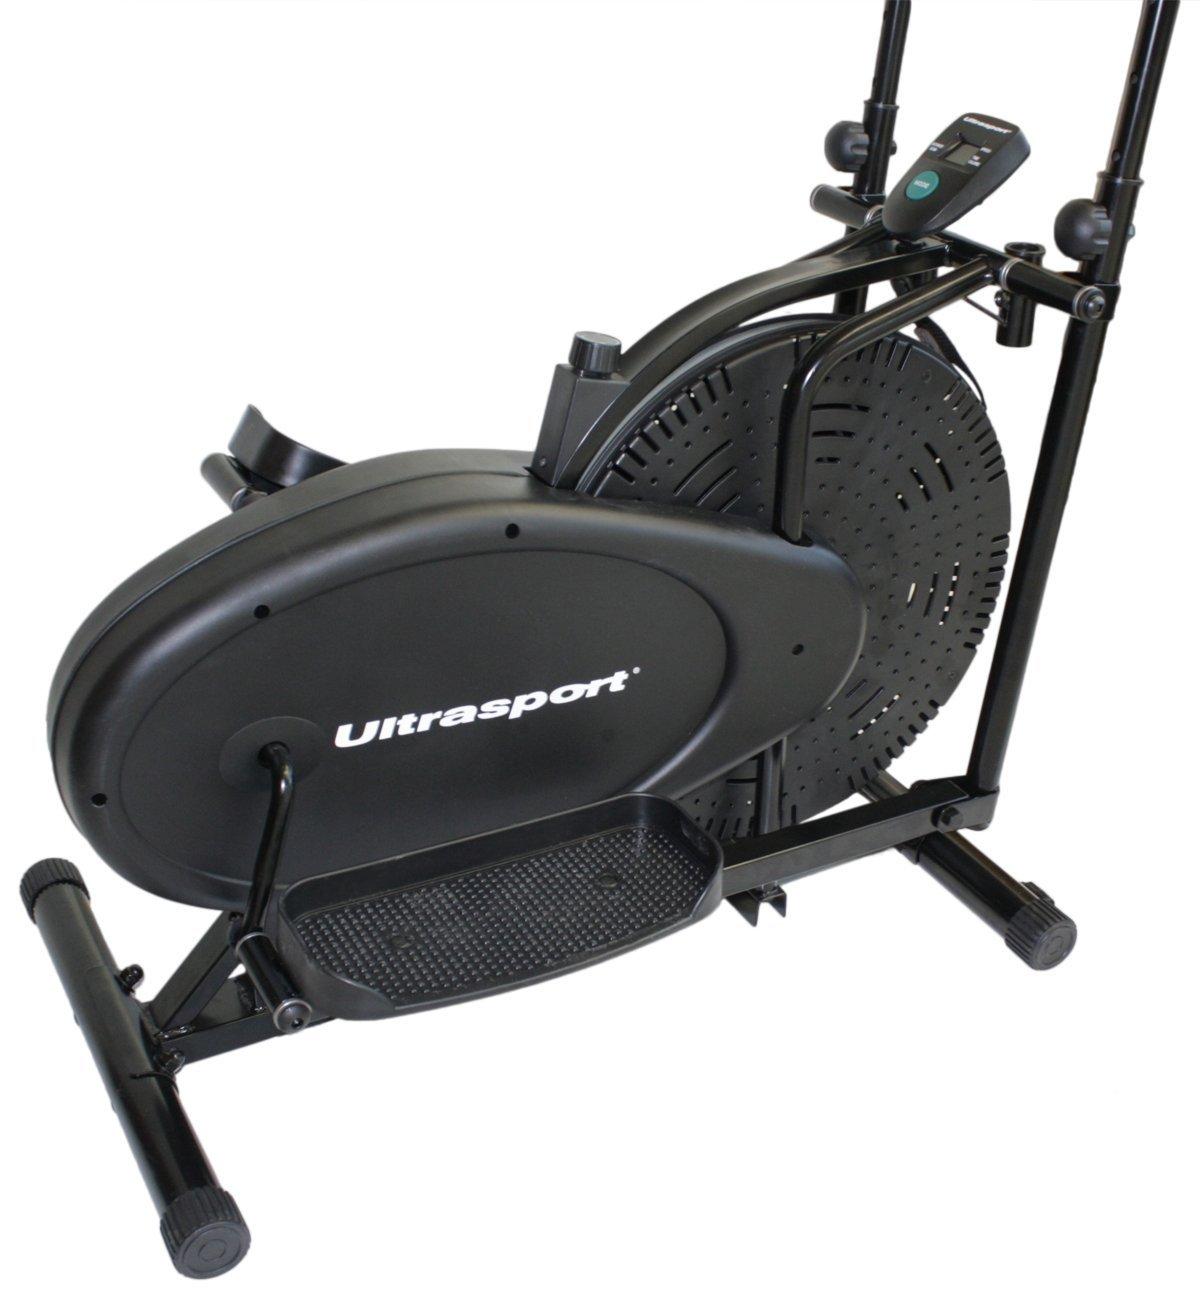 2.Ultrasport Vélo elliptique X-Trainer 100